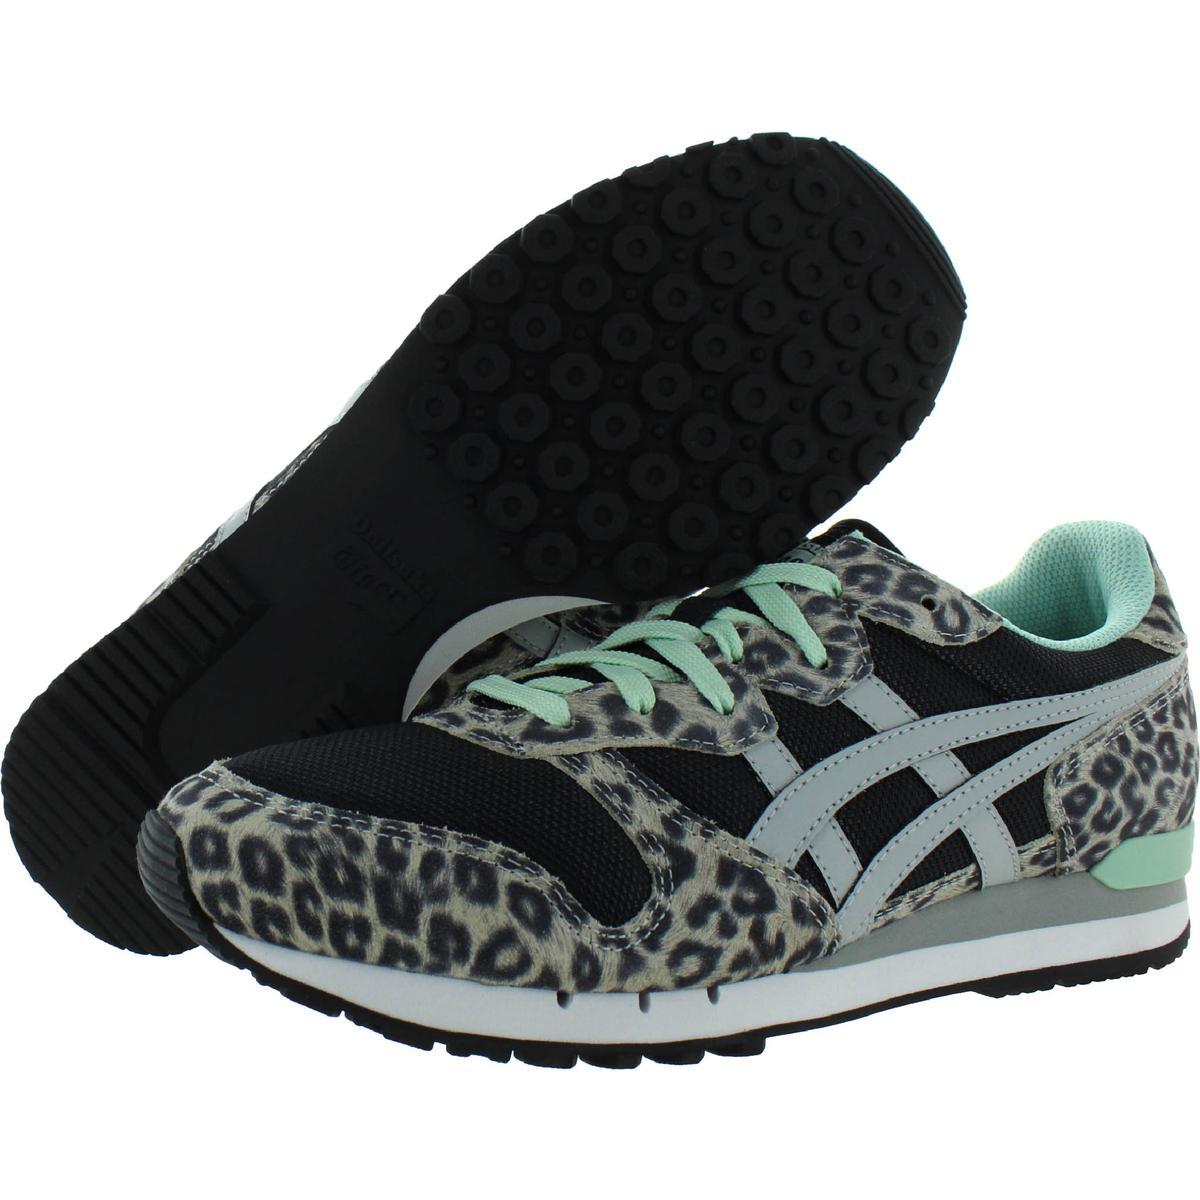 Onitsuka-Tiger-Womens-Alvarado-Running-Cross-Training-Shoes-Sneakers-BHFO-0313 thumbnail 4